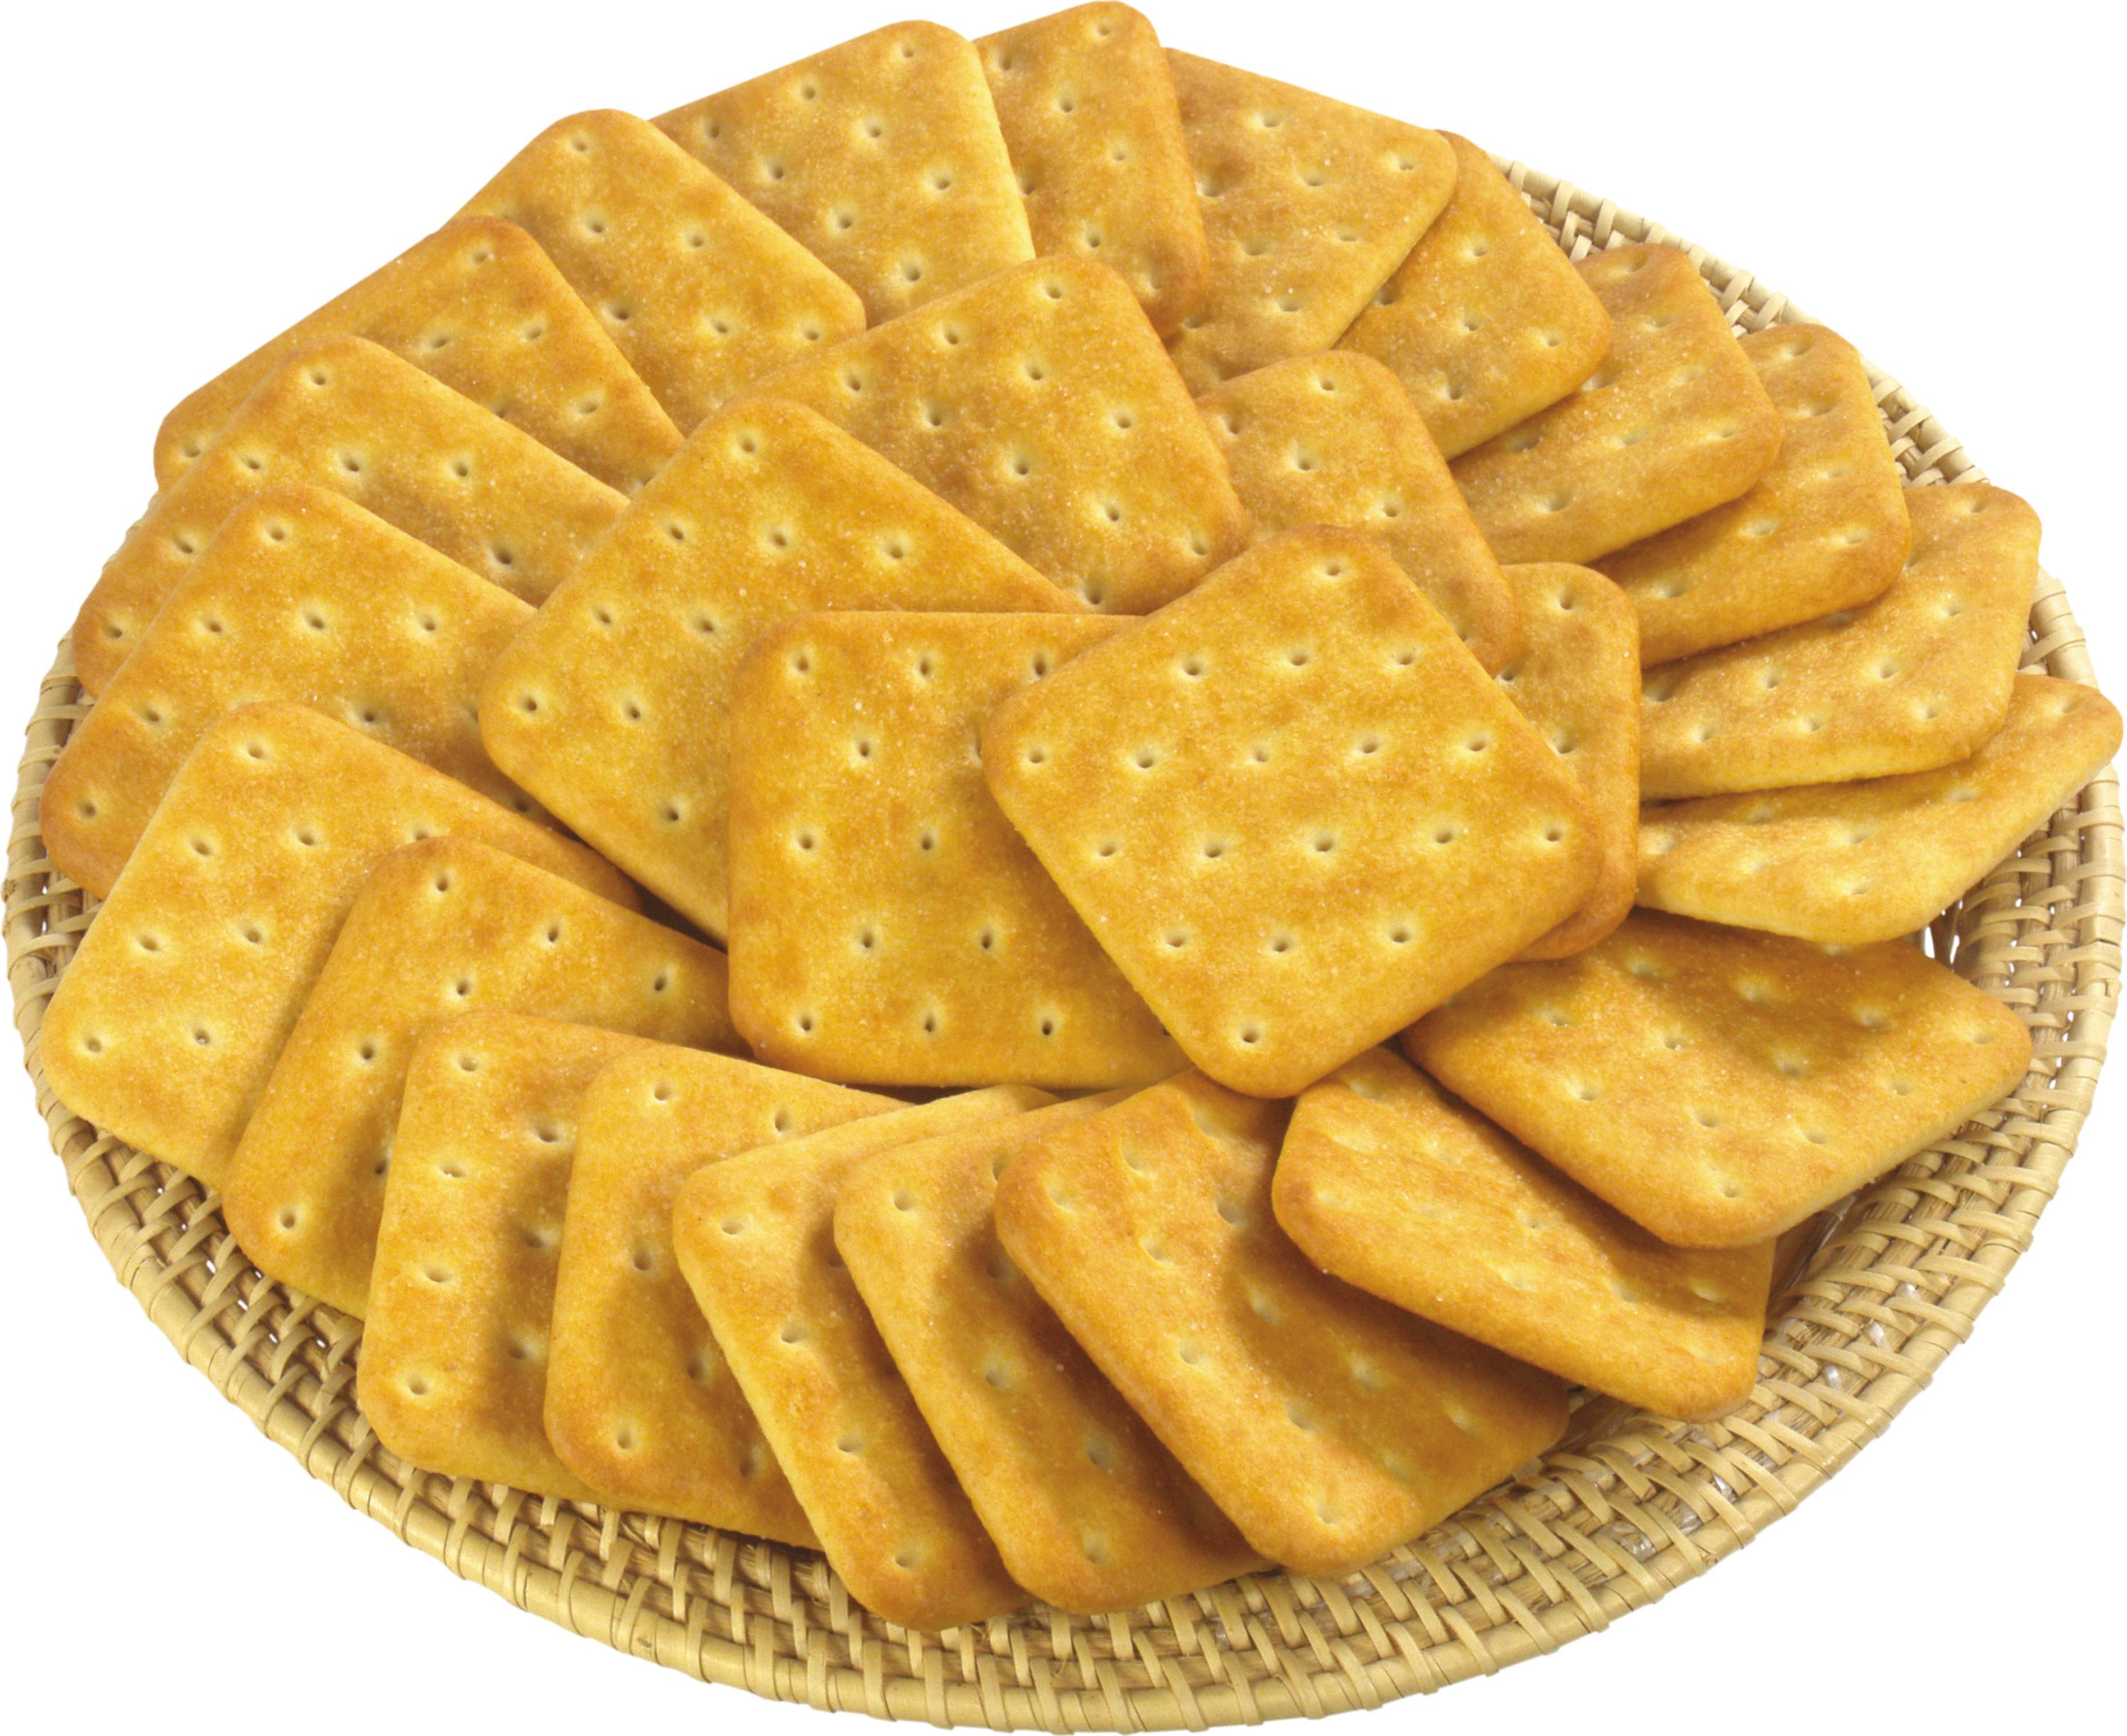 Food clipart cracker. Snacks png image purepng